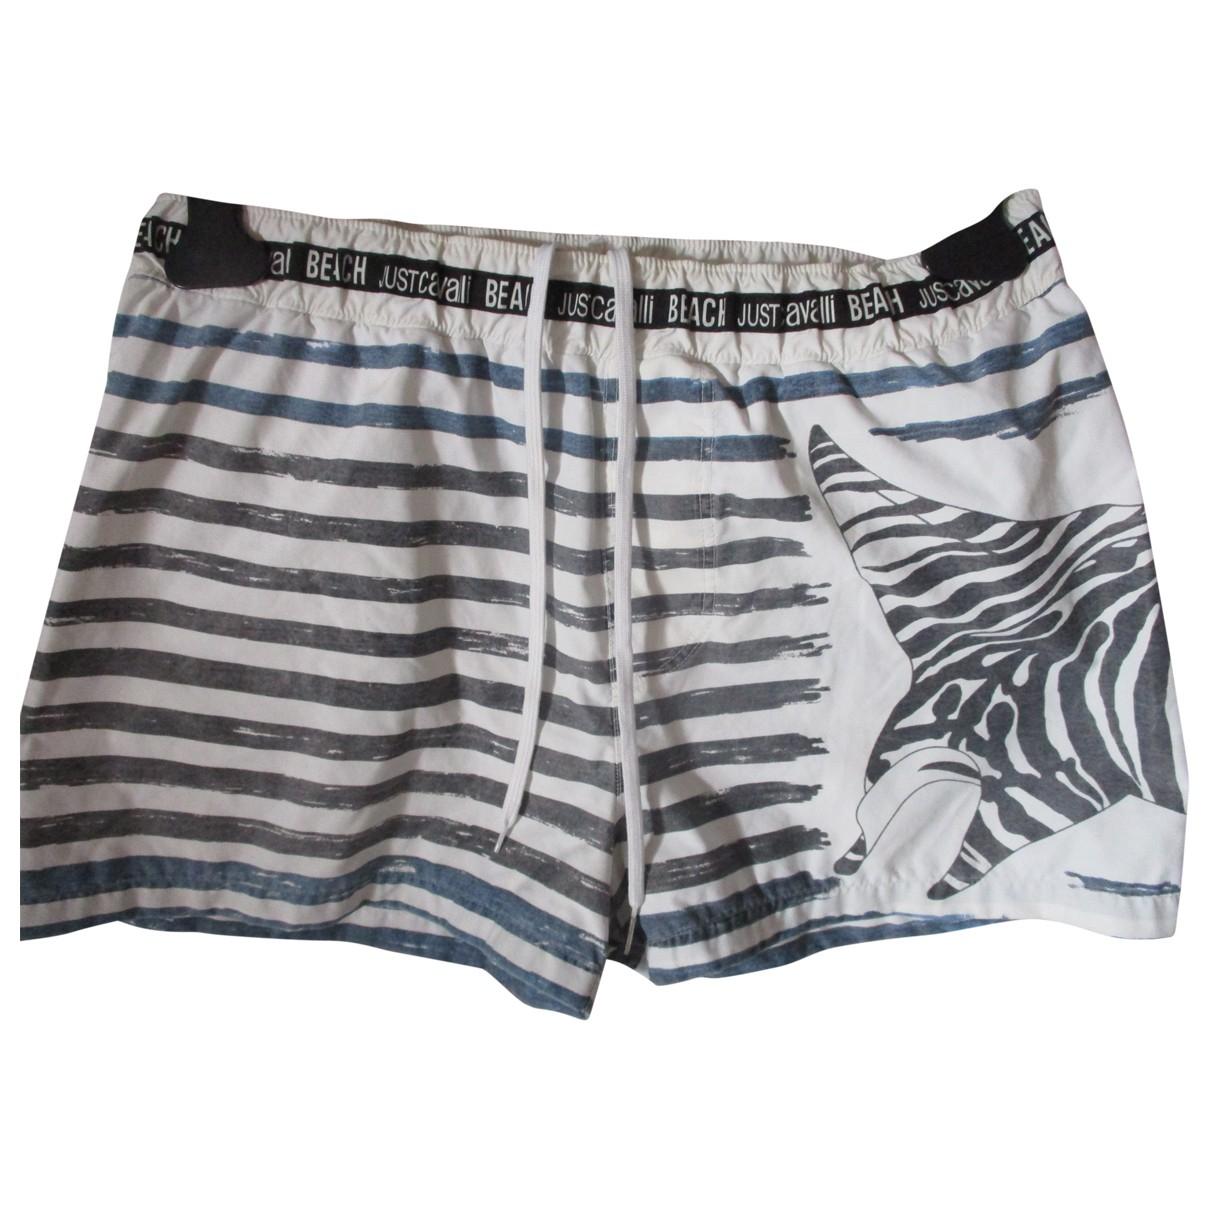 Pantalon corto Just Cavalli